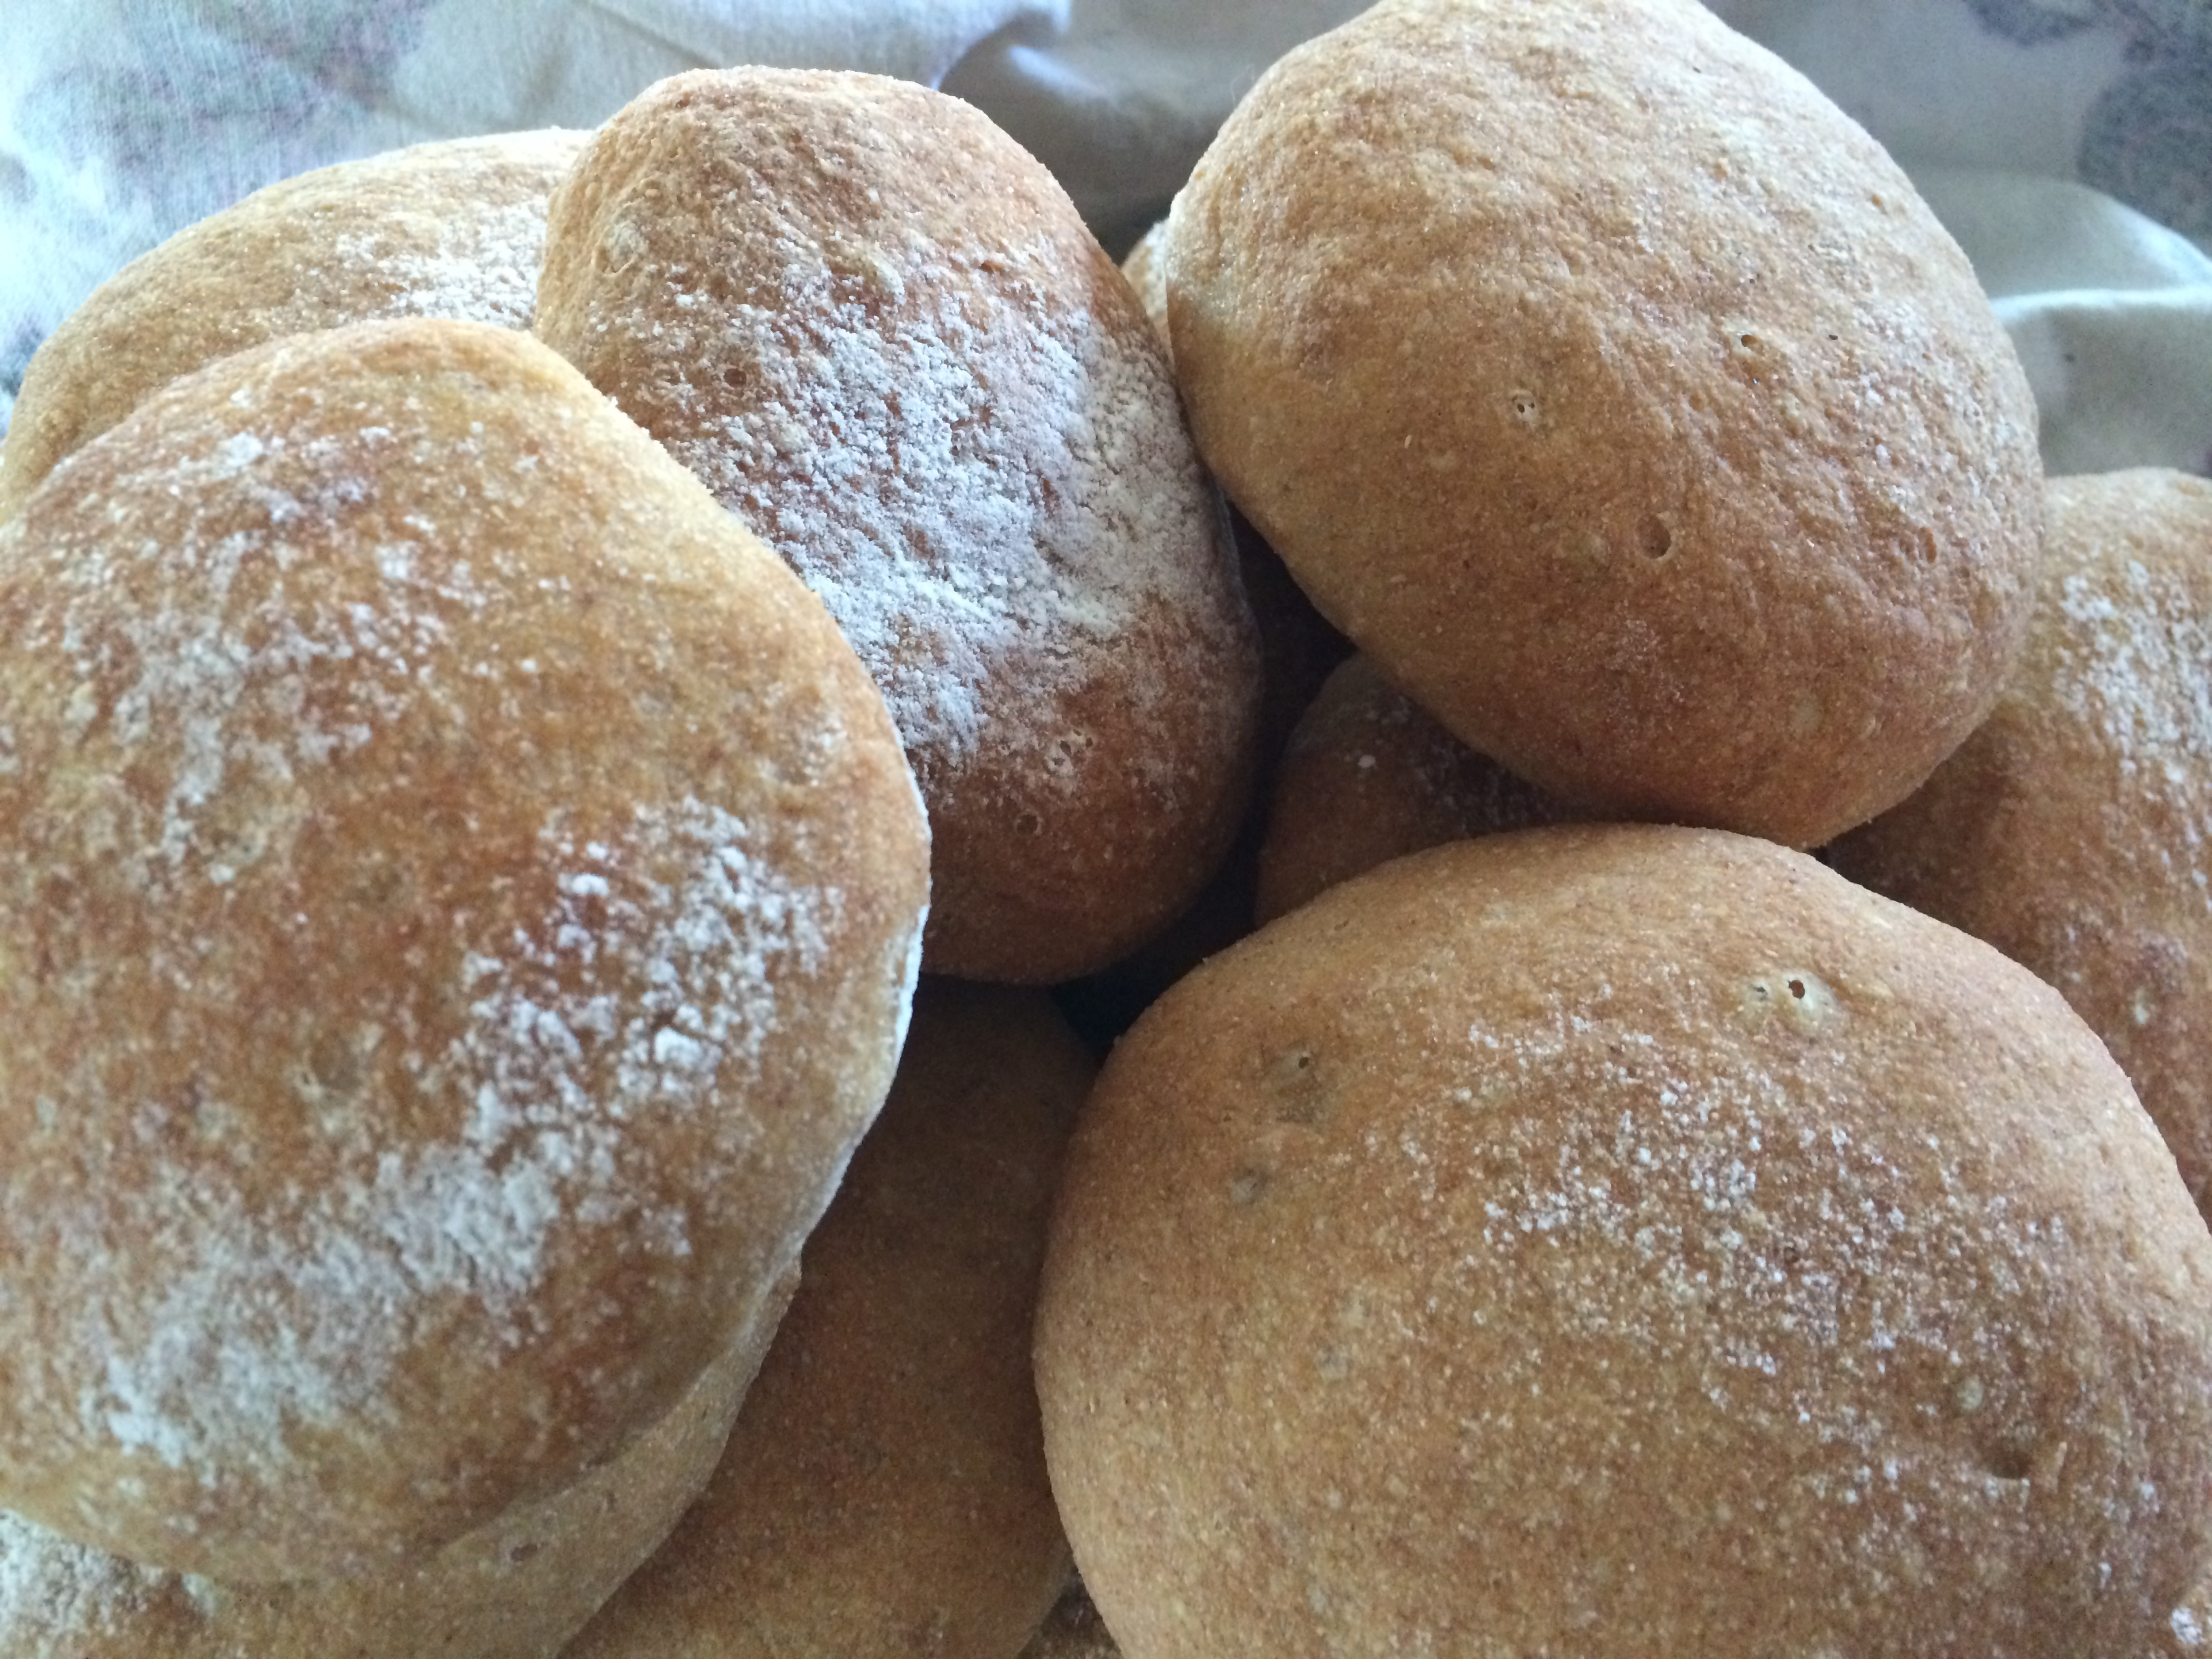 glutenfria recept bröd